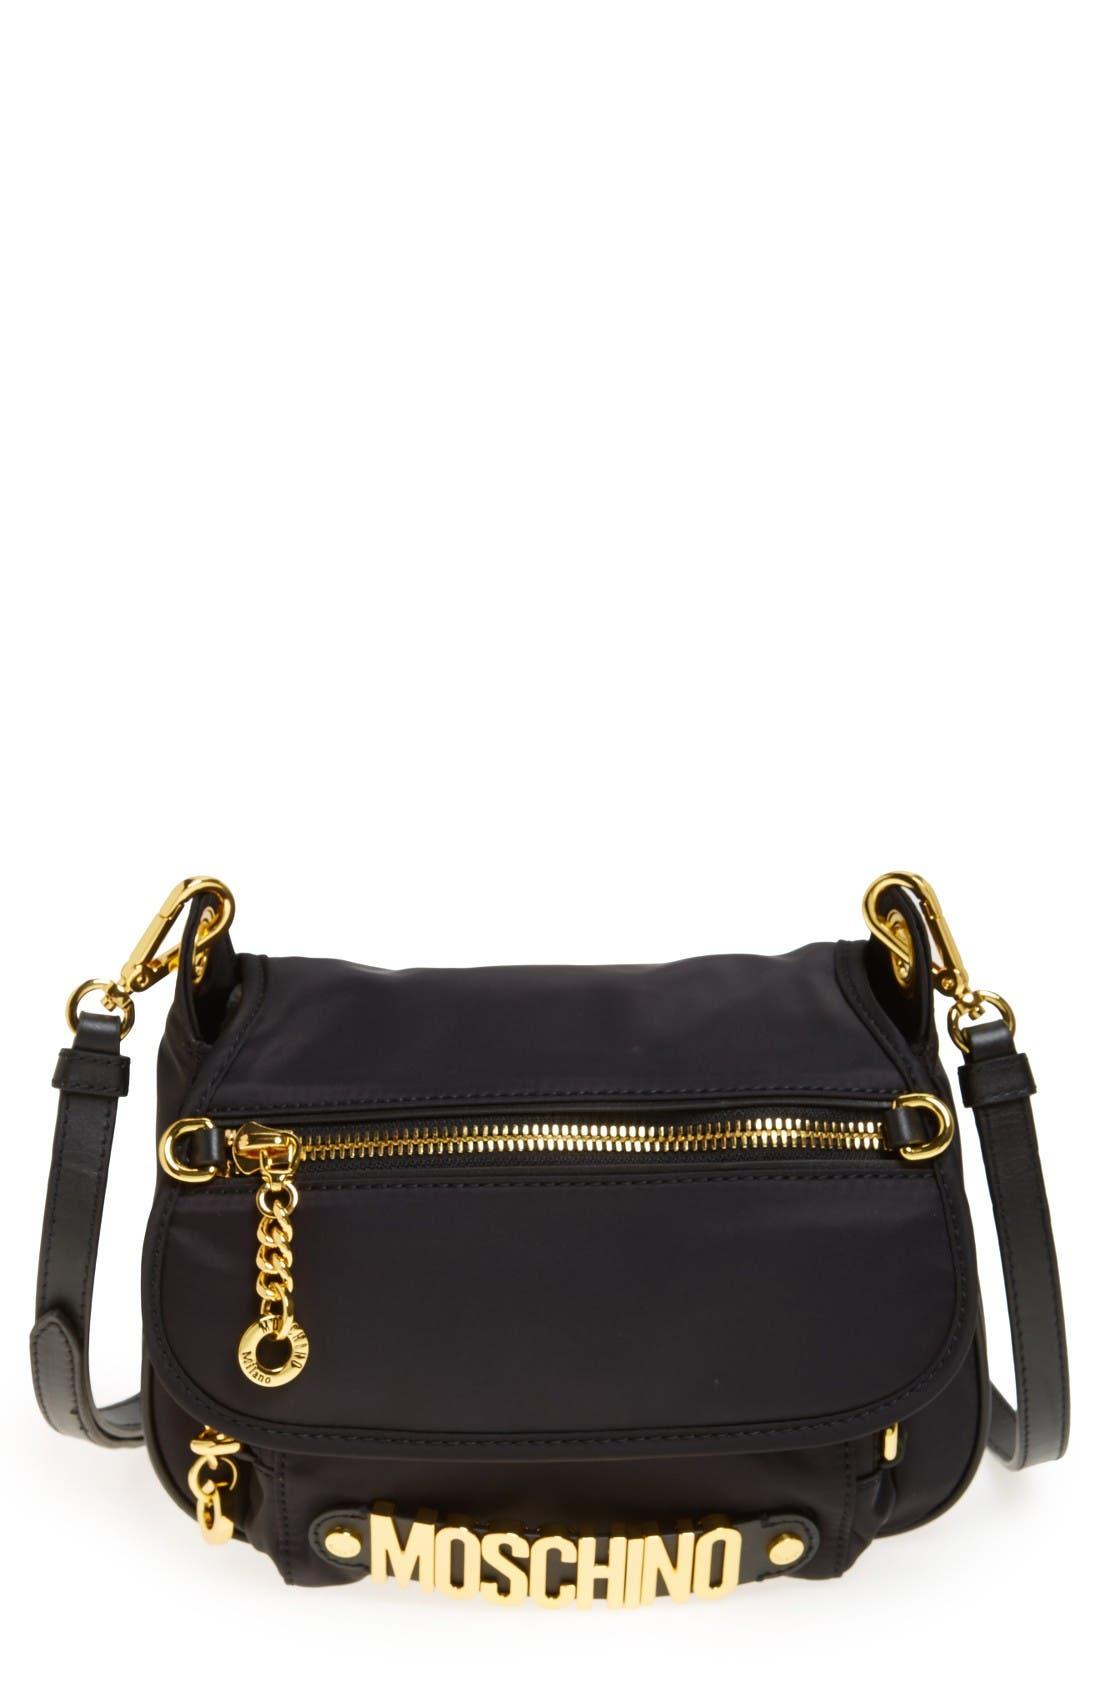 Moschino Nylon Crossbody Bag